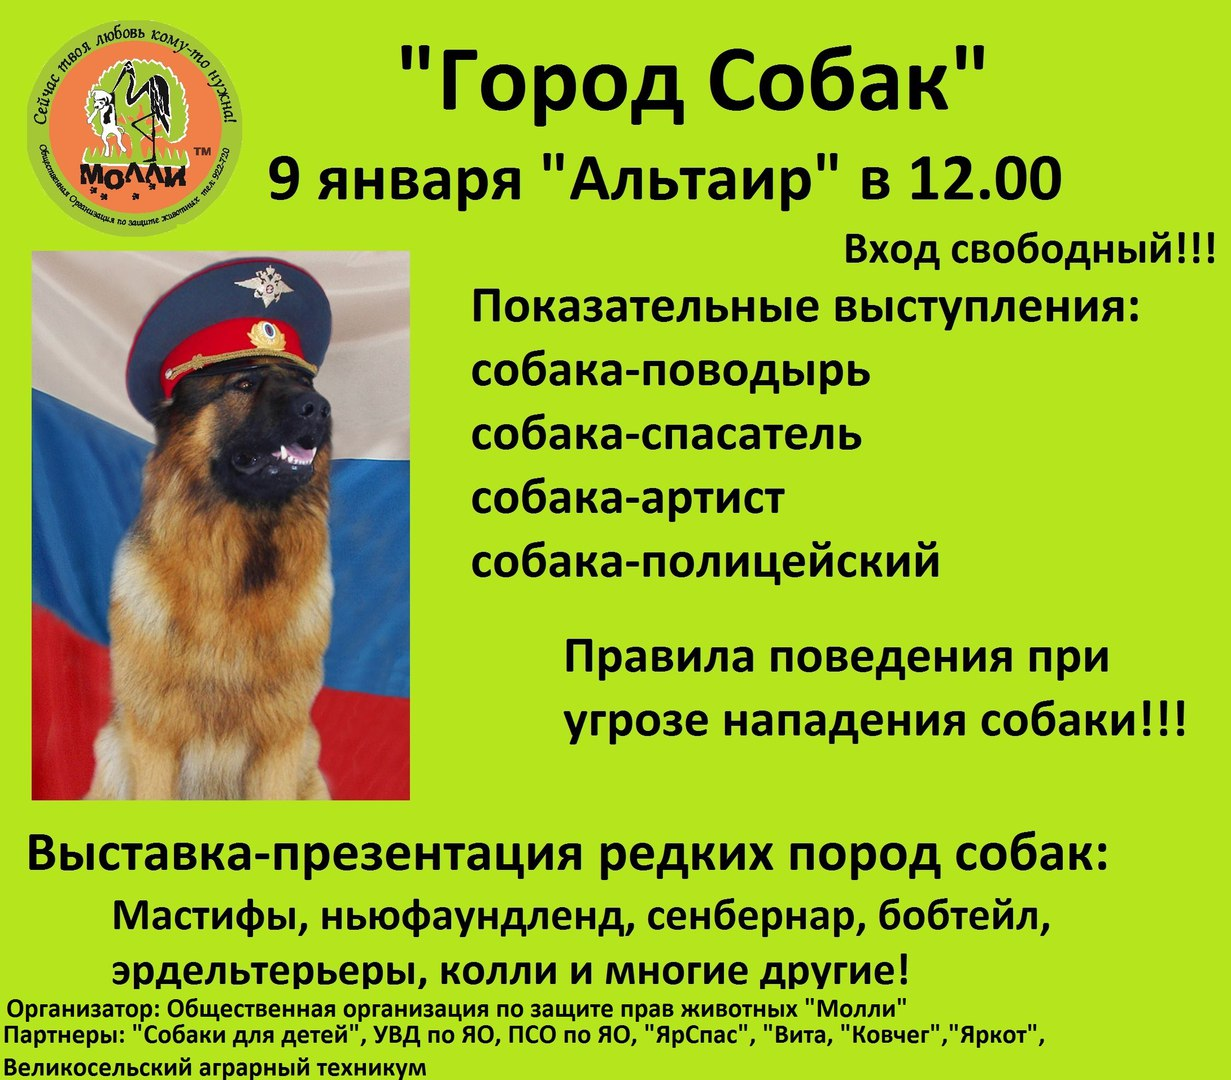 Город собак